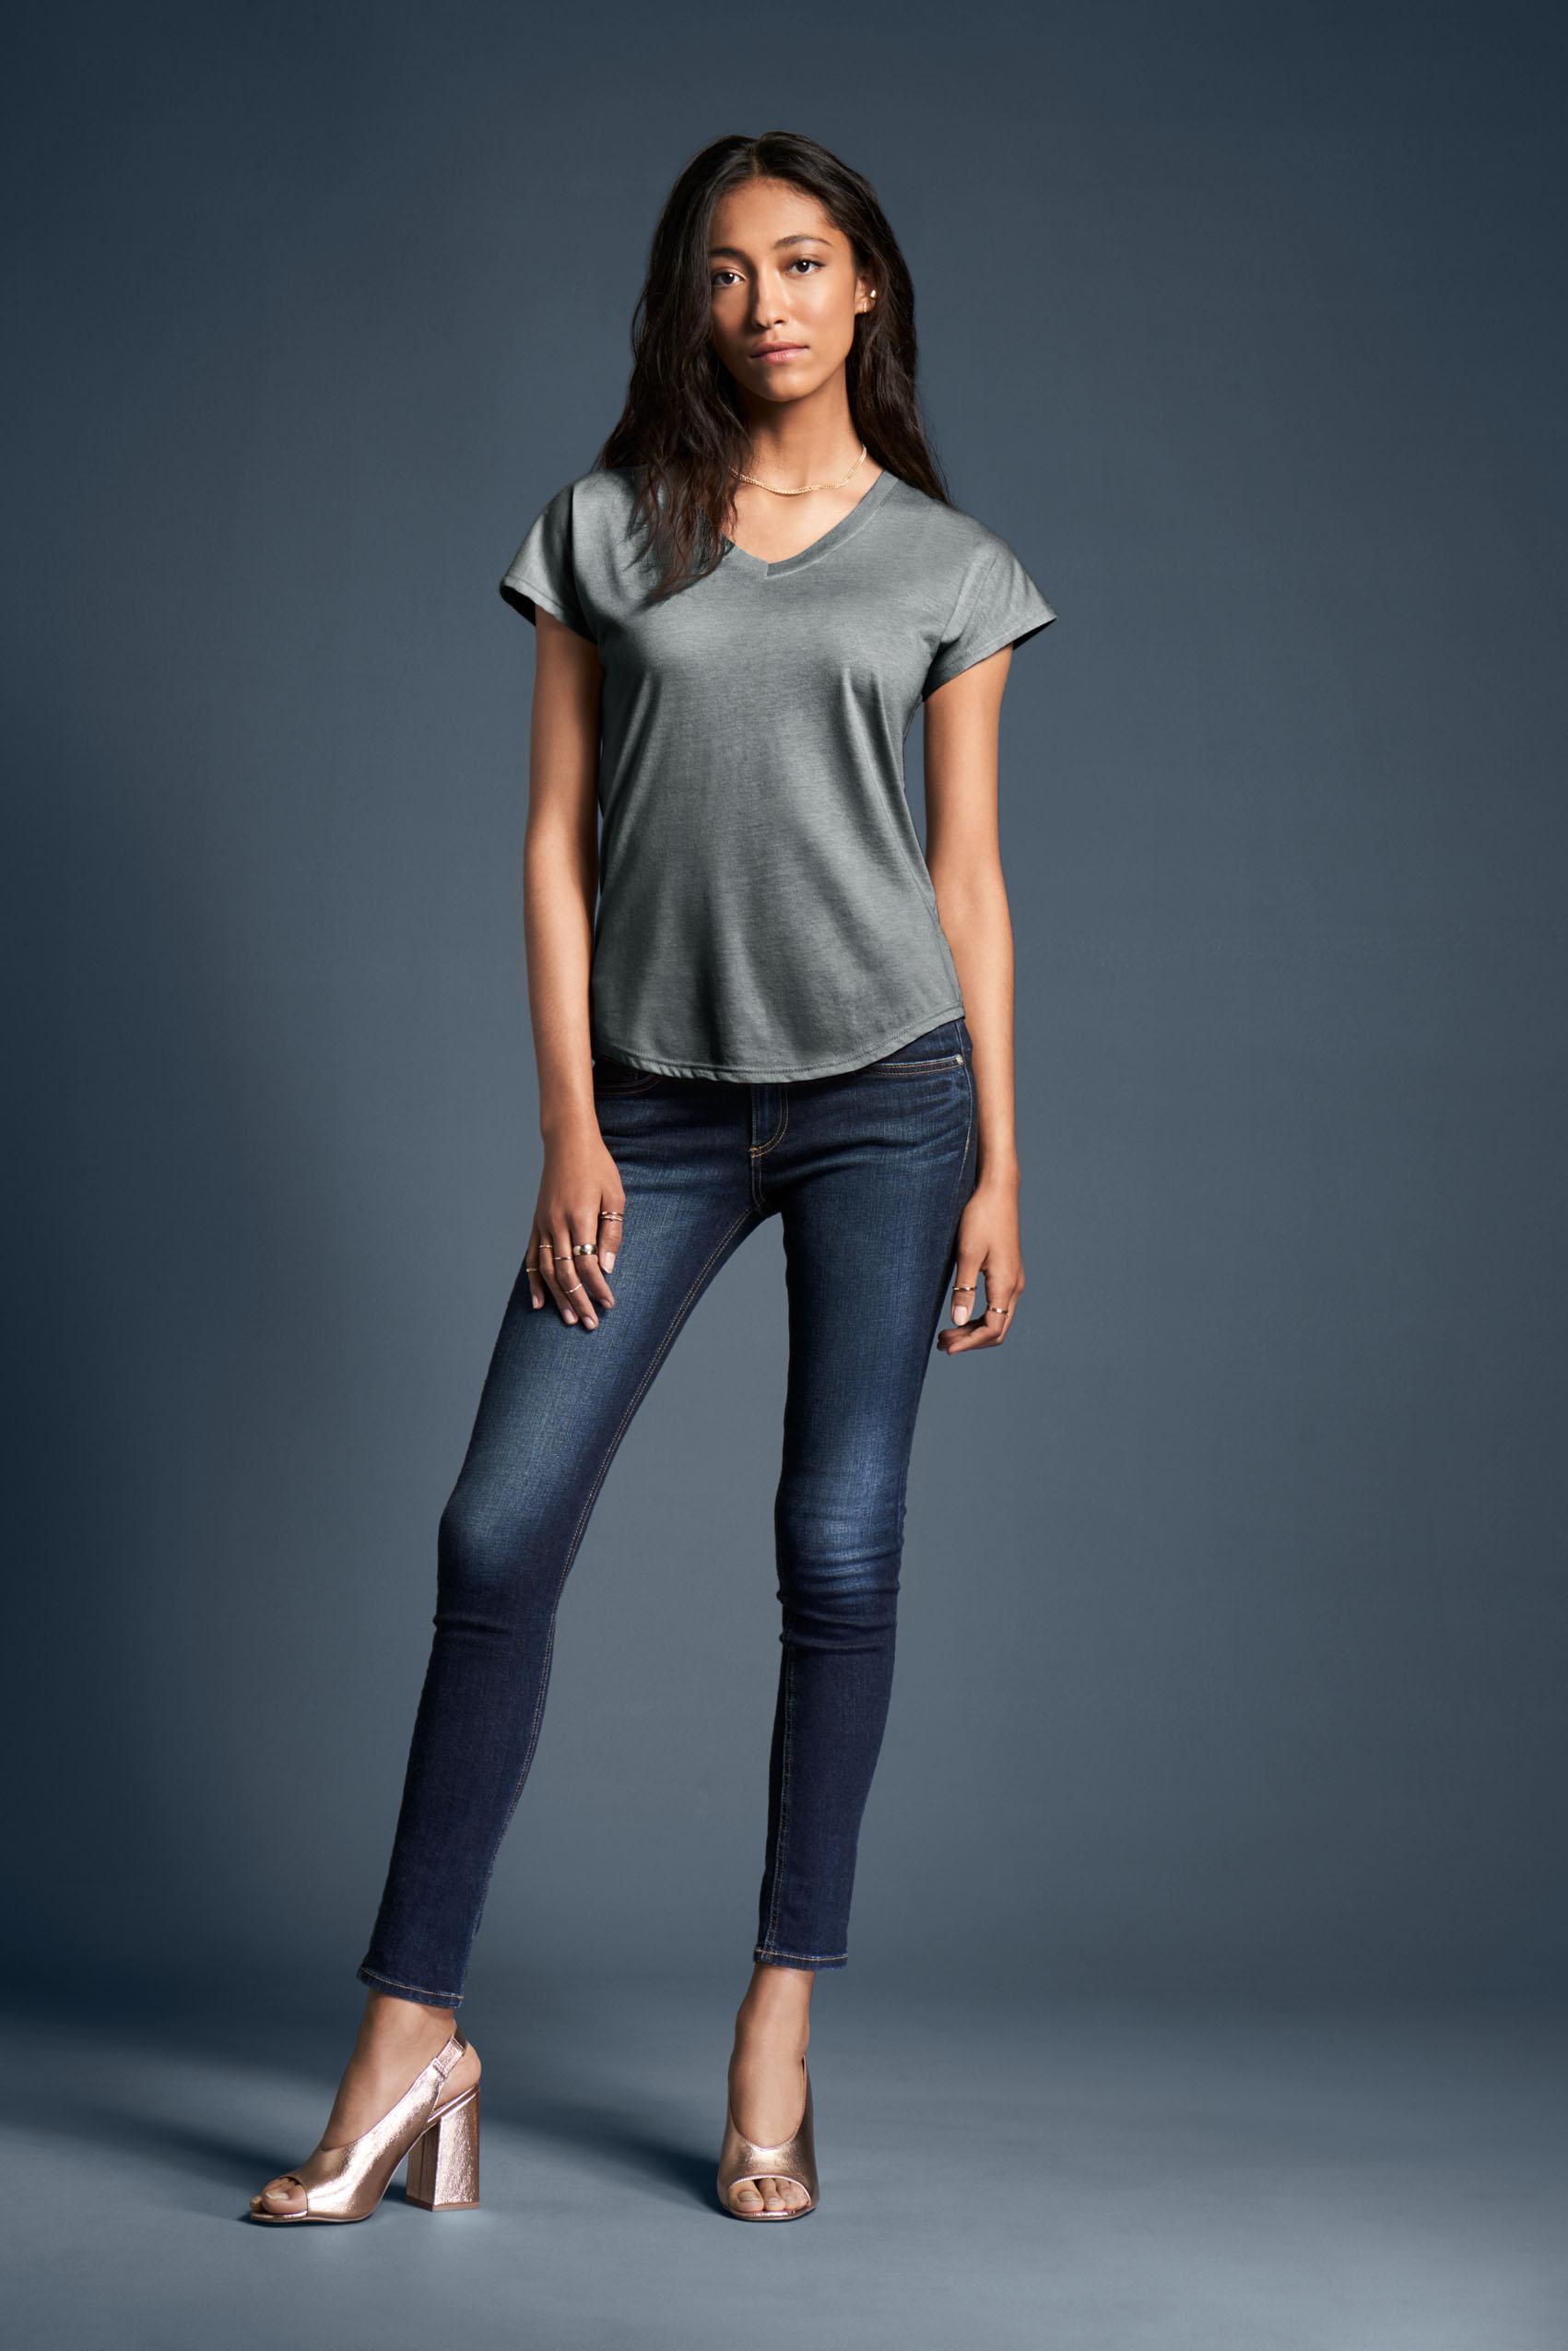 Anvil T-shirt V-neck TriBlend SS for her